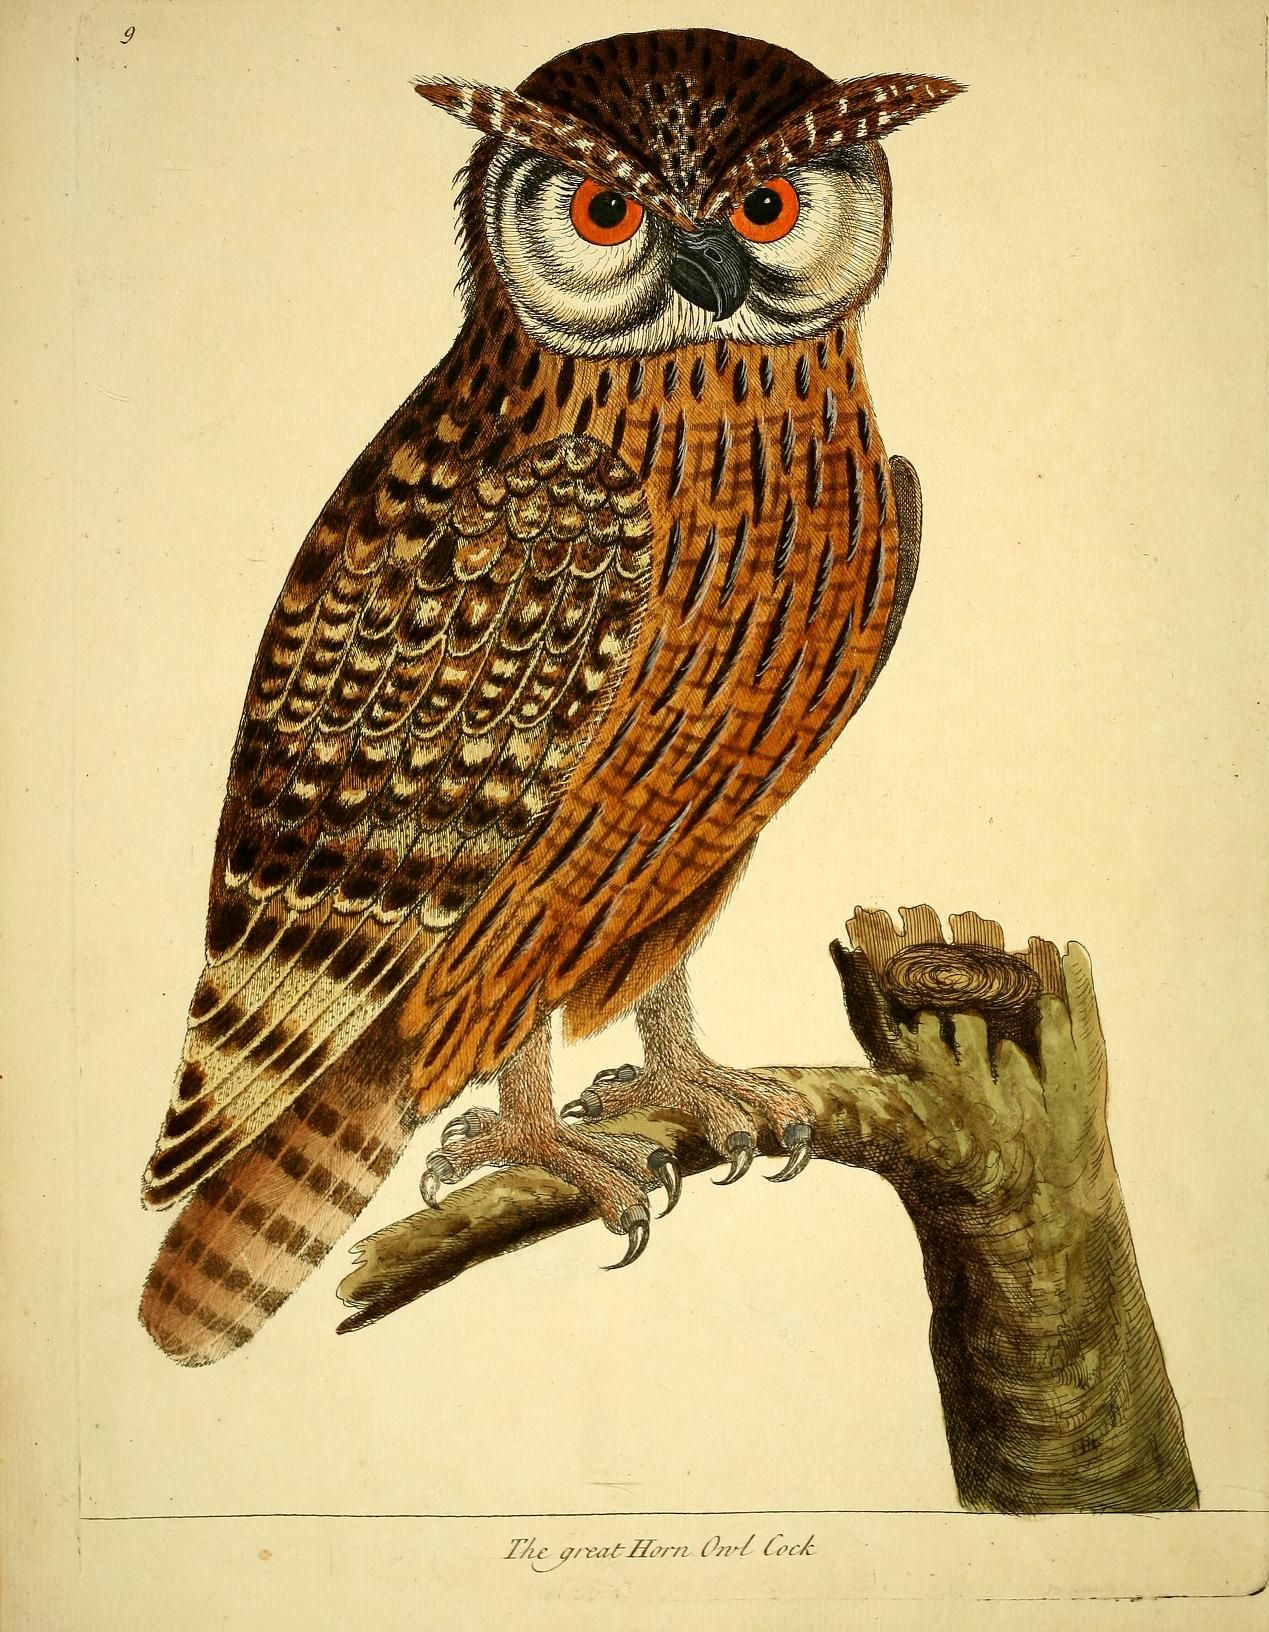 Vintage Owl Illustration By Eleazar Albin From A Natural History Of Birds Vol 2 1731 Bird Prints Owl Bird Art